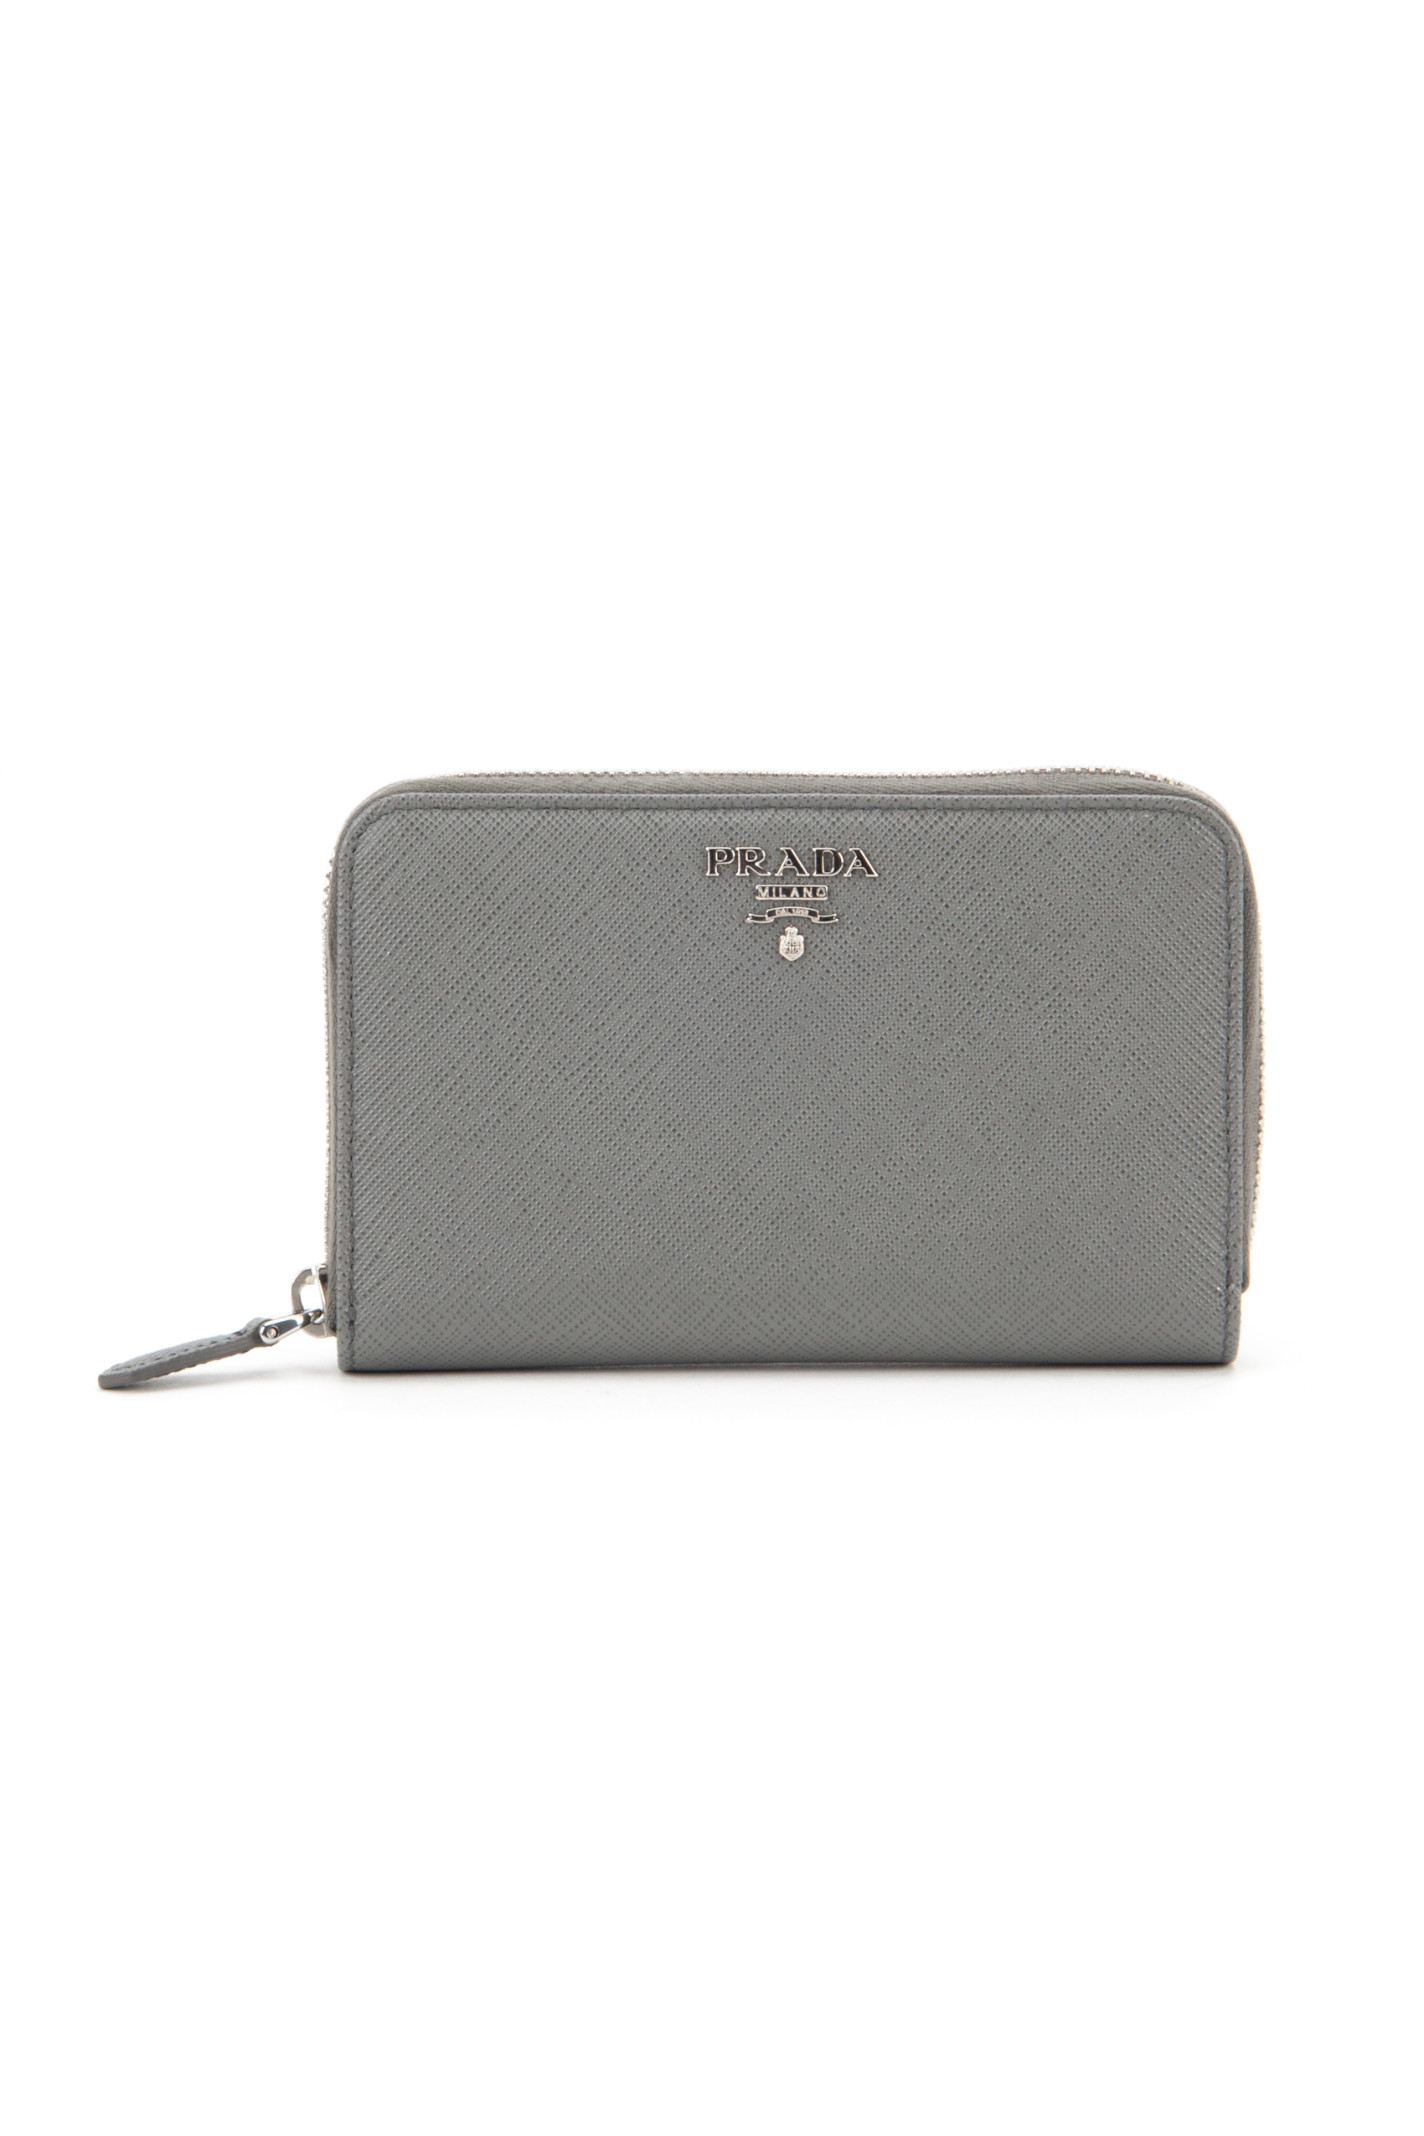 prada saffiano wallet on a chain - prada white wallet